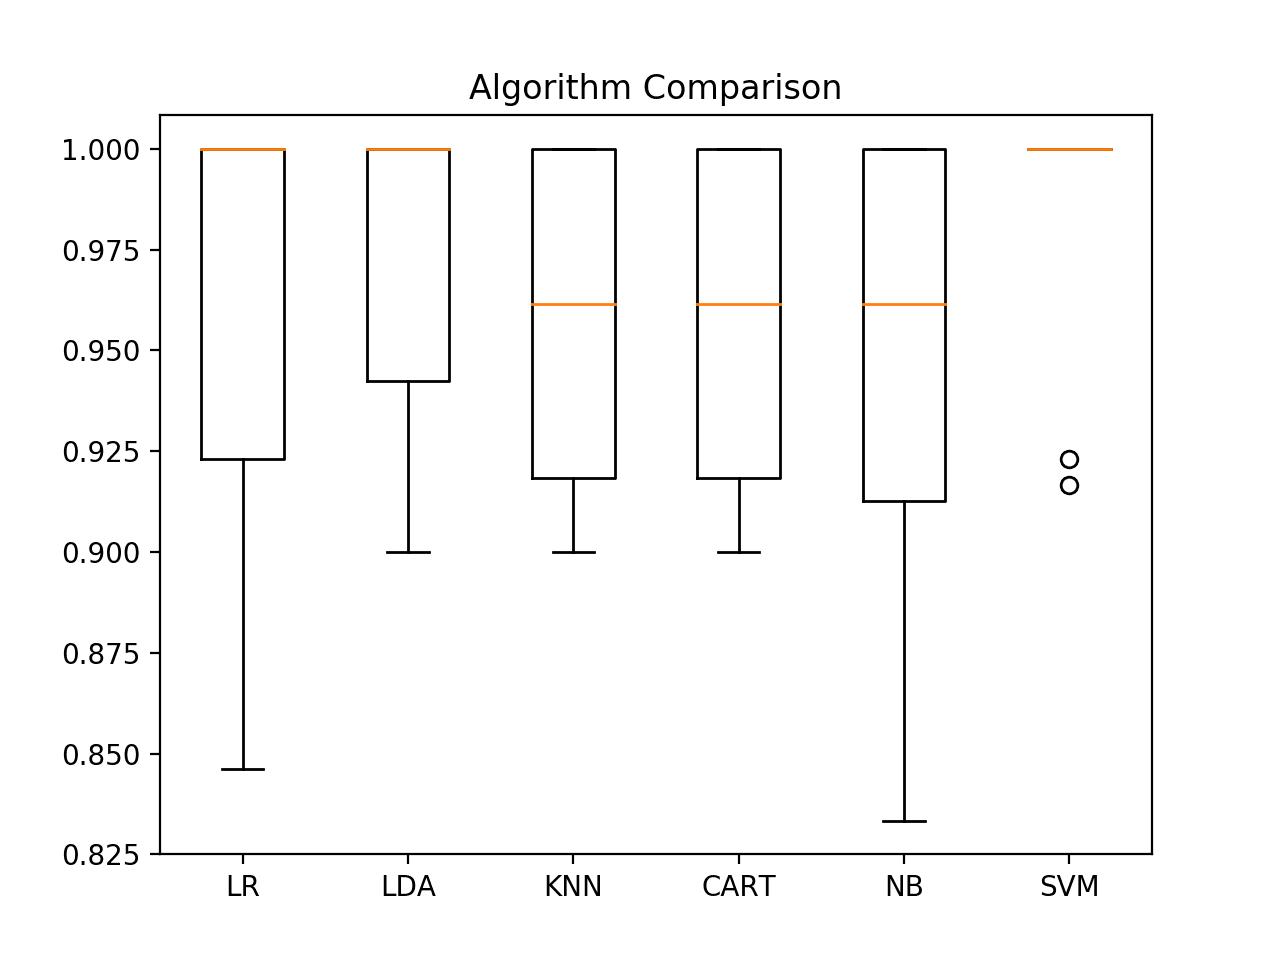 Box and Whisker Plot Comparing Machine Learning Algorithms on the Iris Flowers Dataset